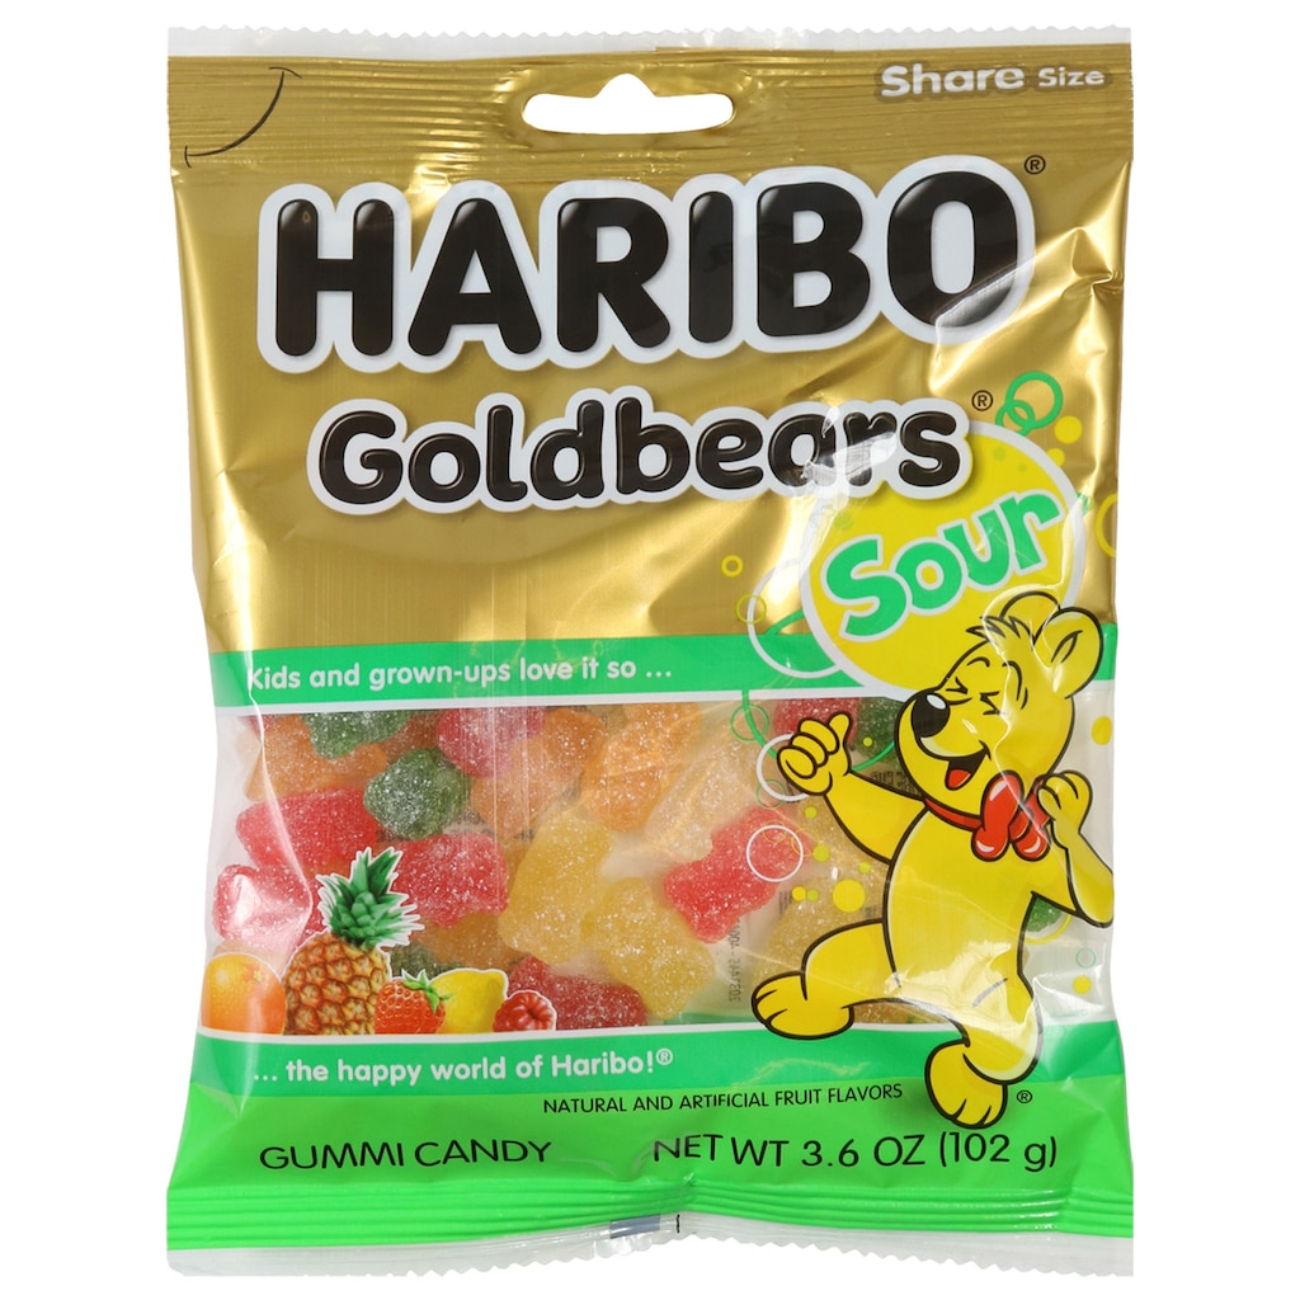 Haribo Sour Gold-Bears Gummi Candies, 3.6 oz. Bags